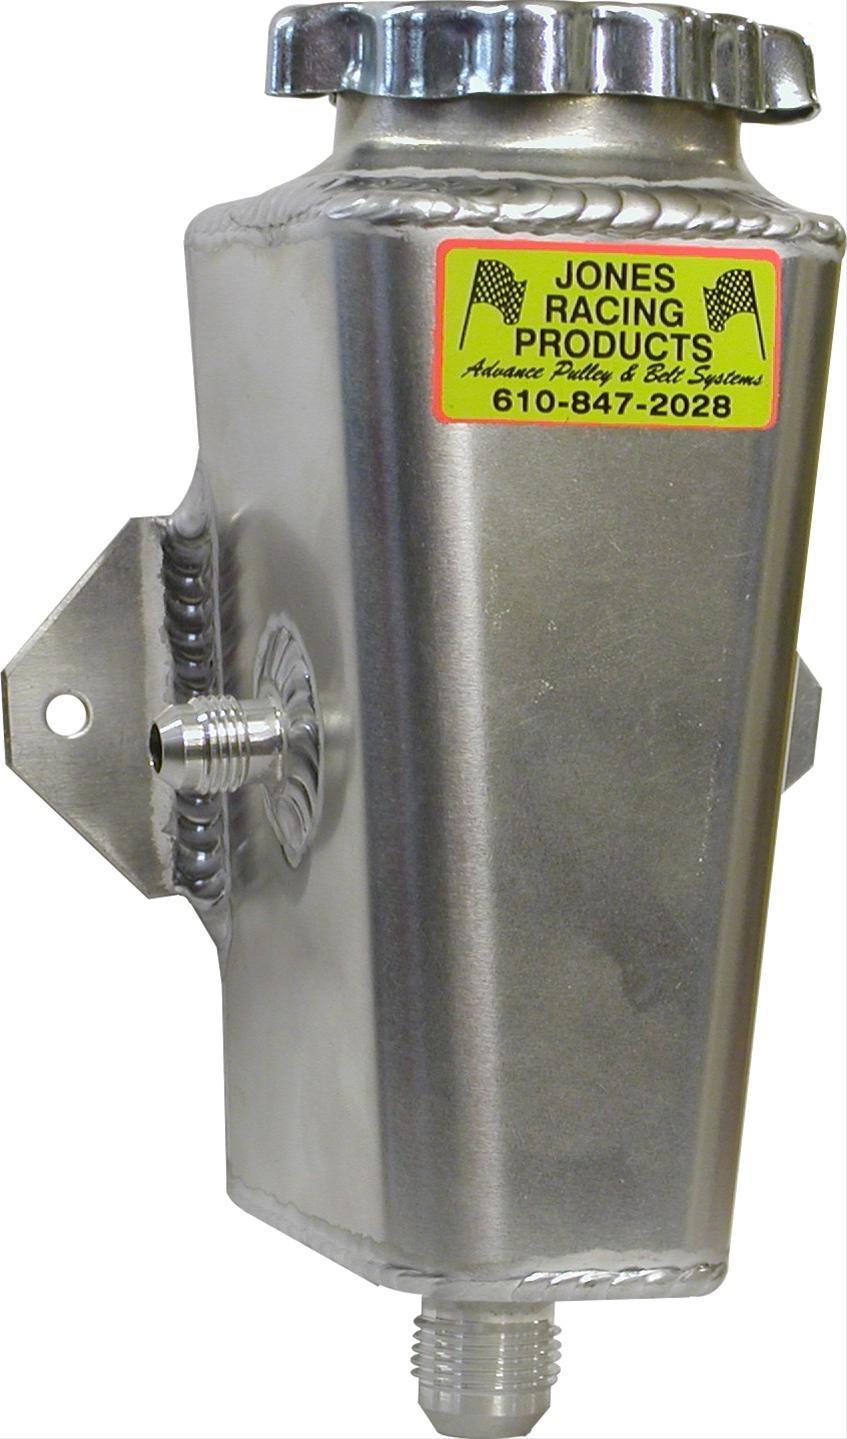 Jones Racing Products Tank Power Steering Firewall Mount